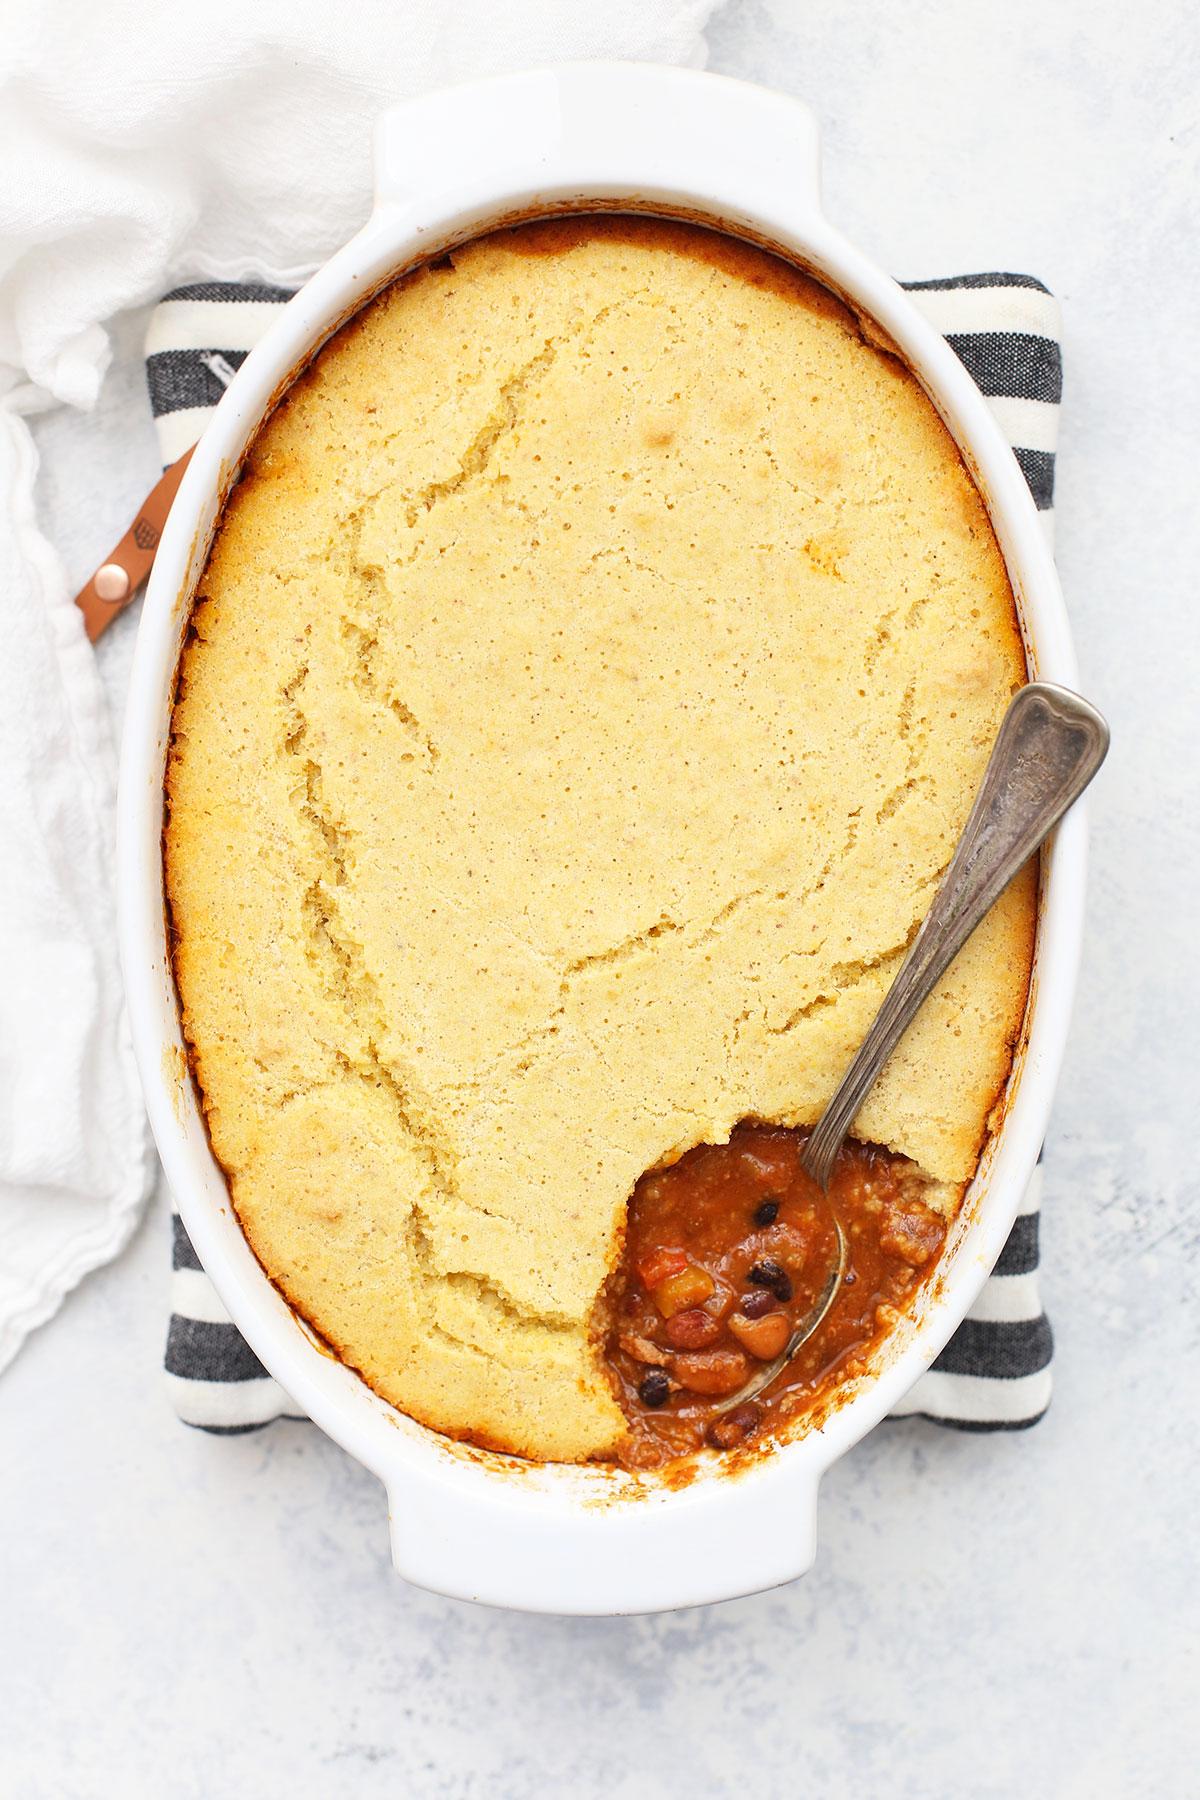 Overhead view of chili cornbread pot pie with spoon in it